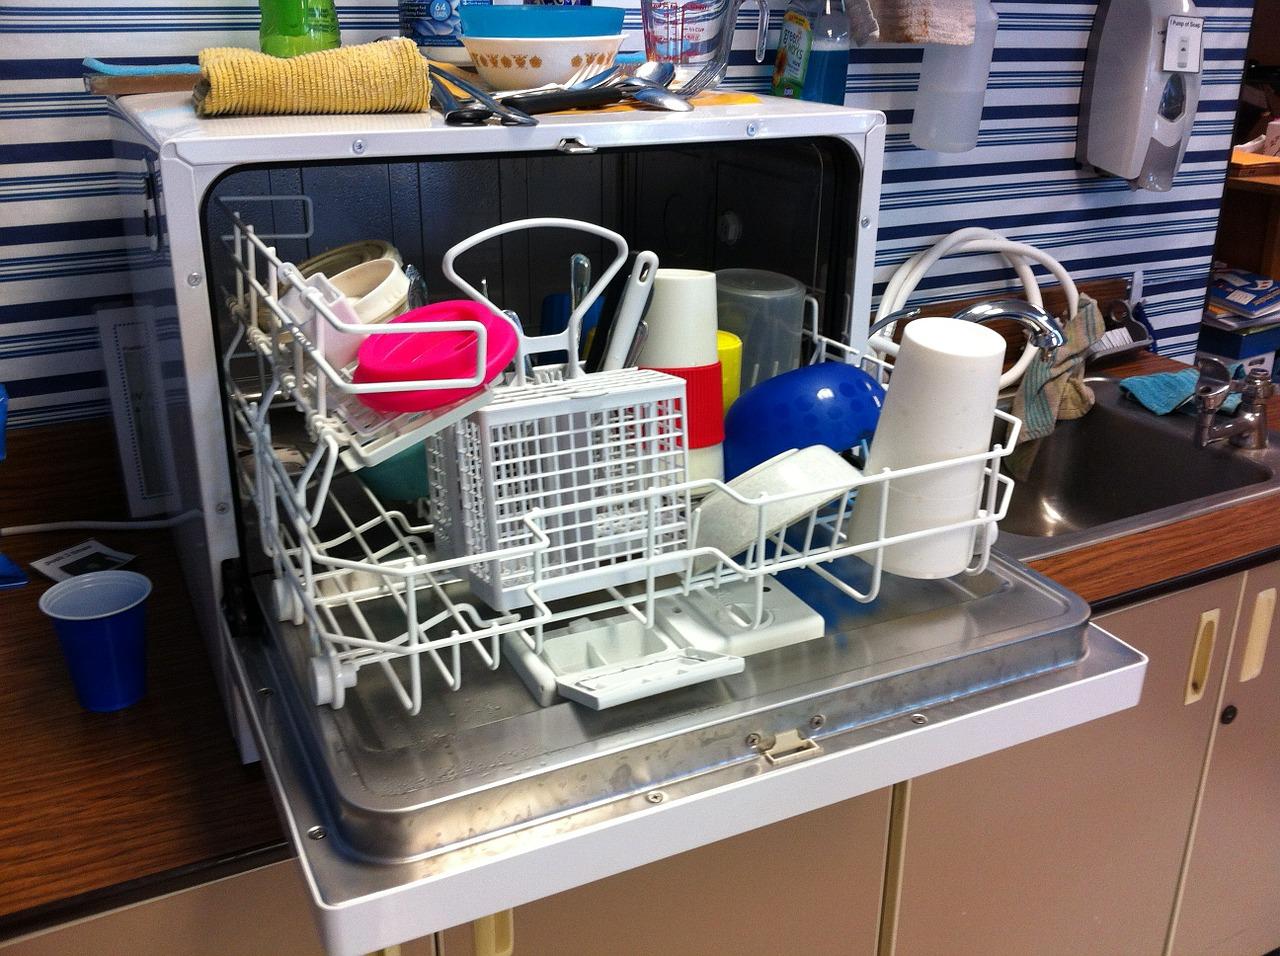 Full compact dishwasher